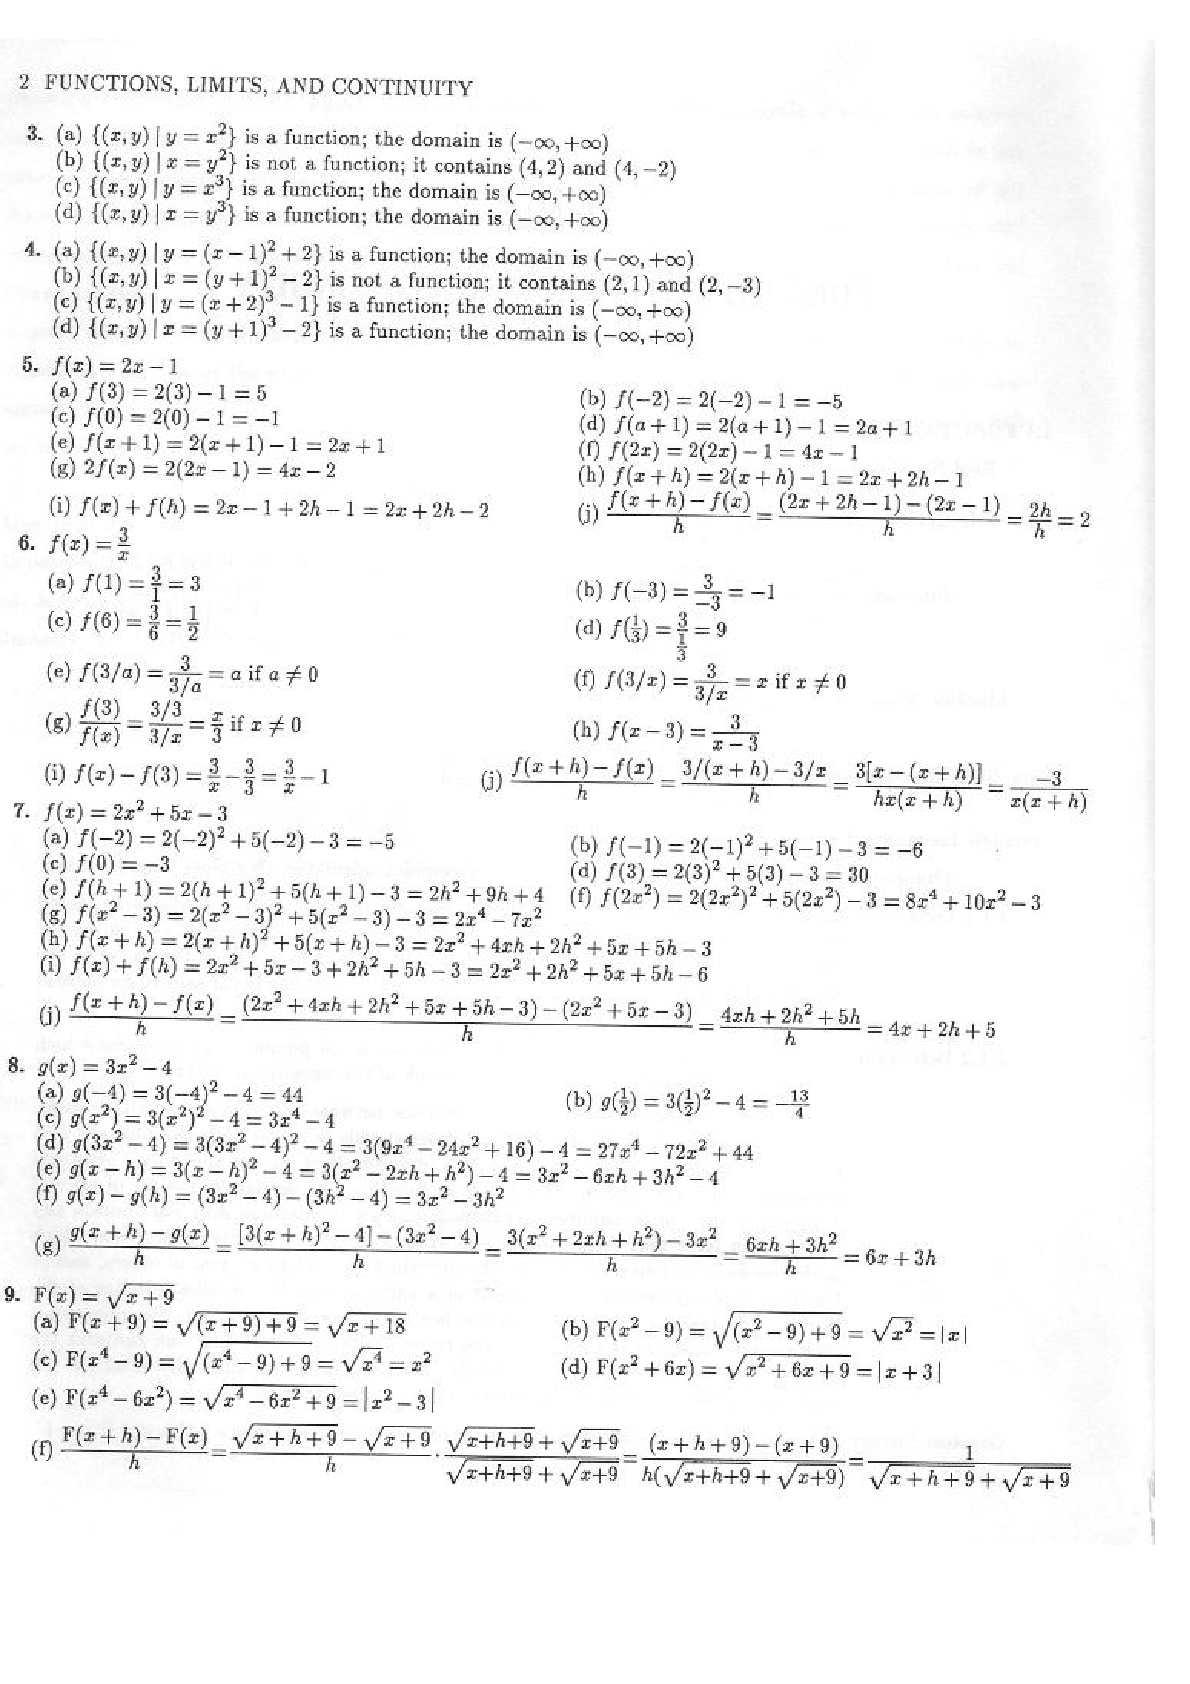 solucionario del libro de calculo de leithold